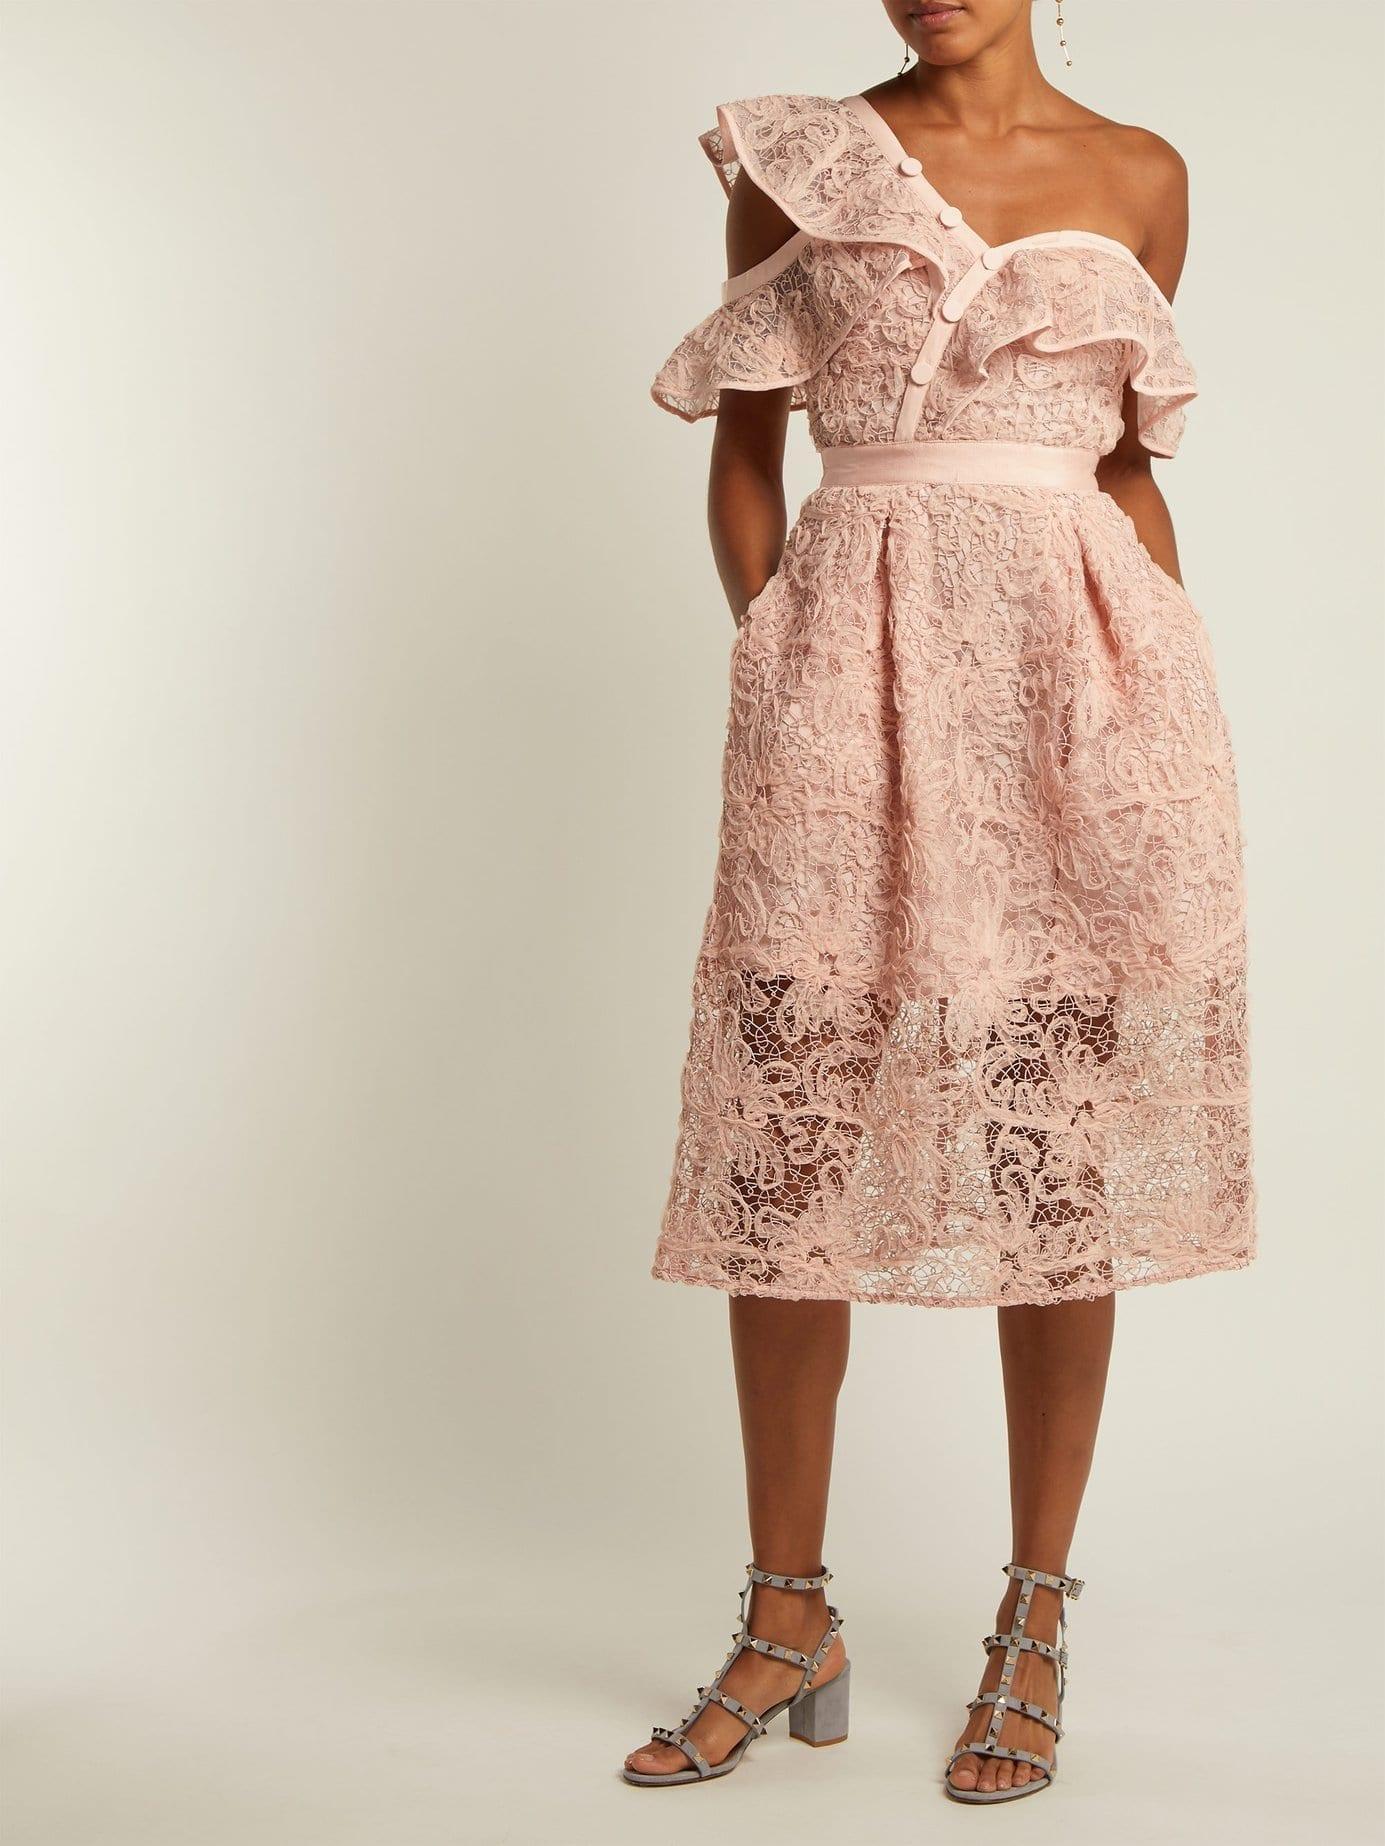 SELF-PORTRAIT Asymmetric Floral Lace Midi Light Pink Dress